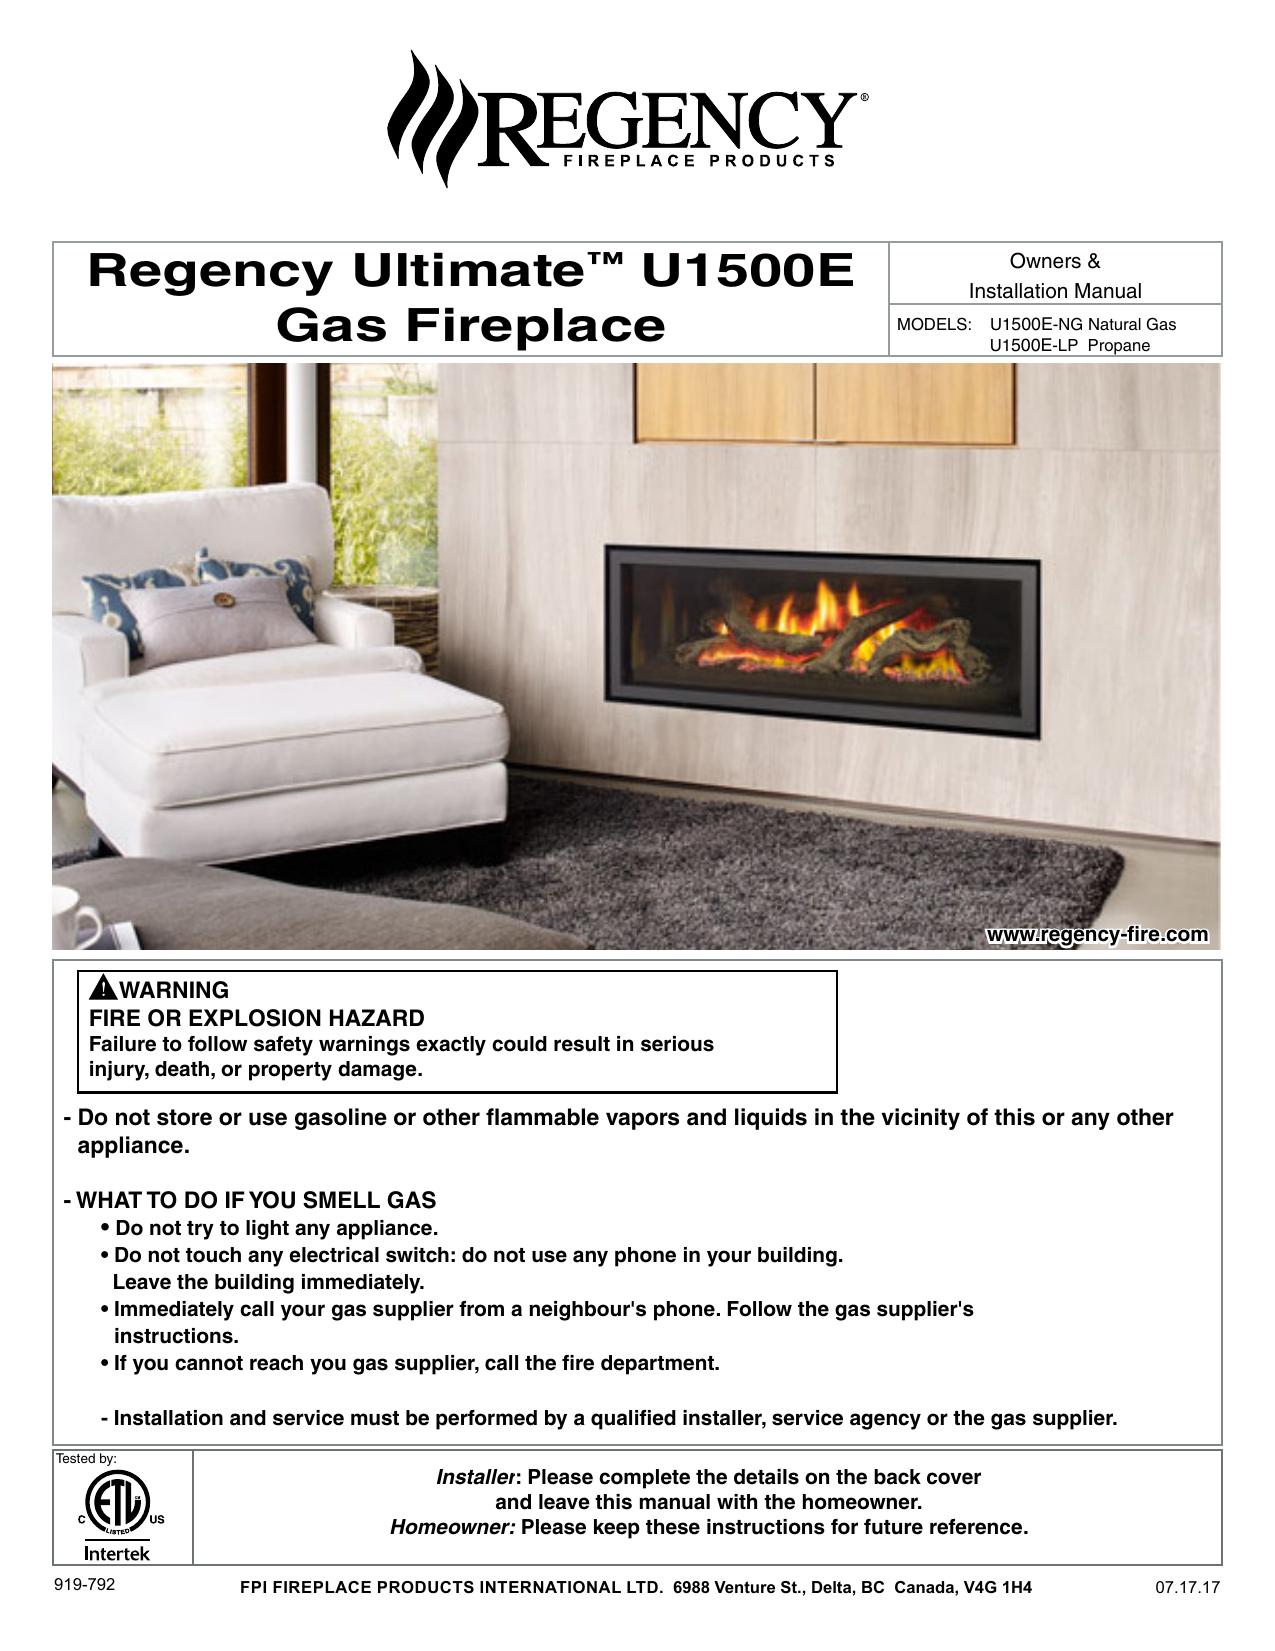 Regency Ultimate U1500e Gas Fireplace